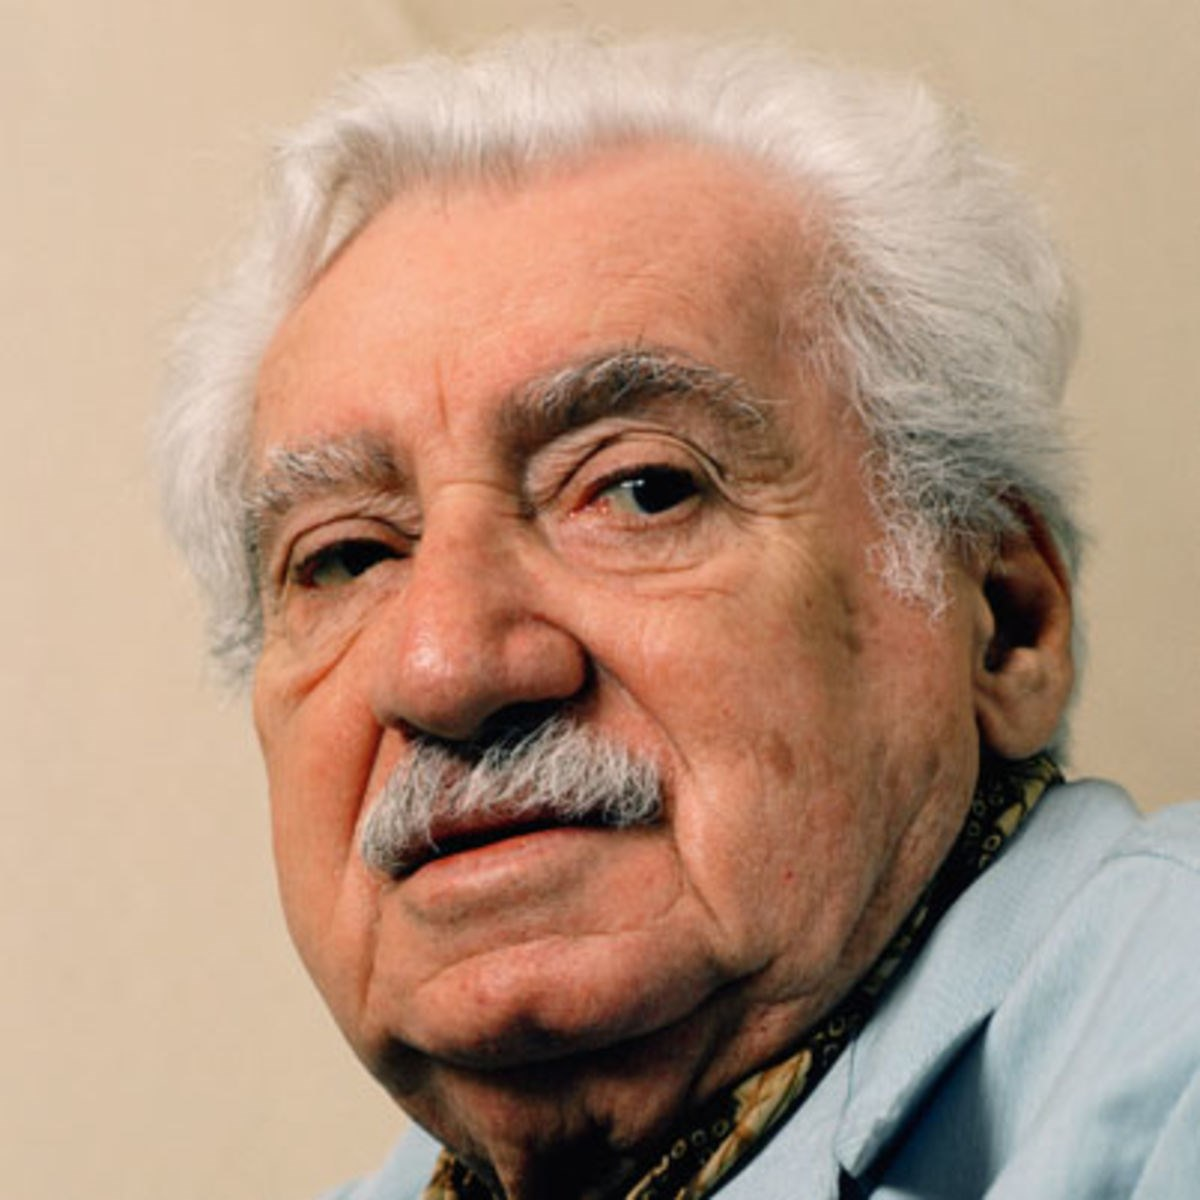 10 de Agosto - Jorge Amado, escritor brasileiro.jpg (Moderado)